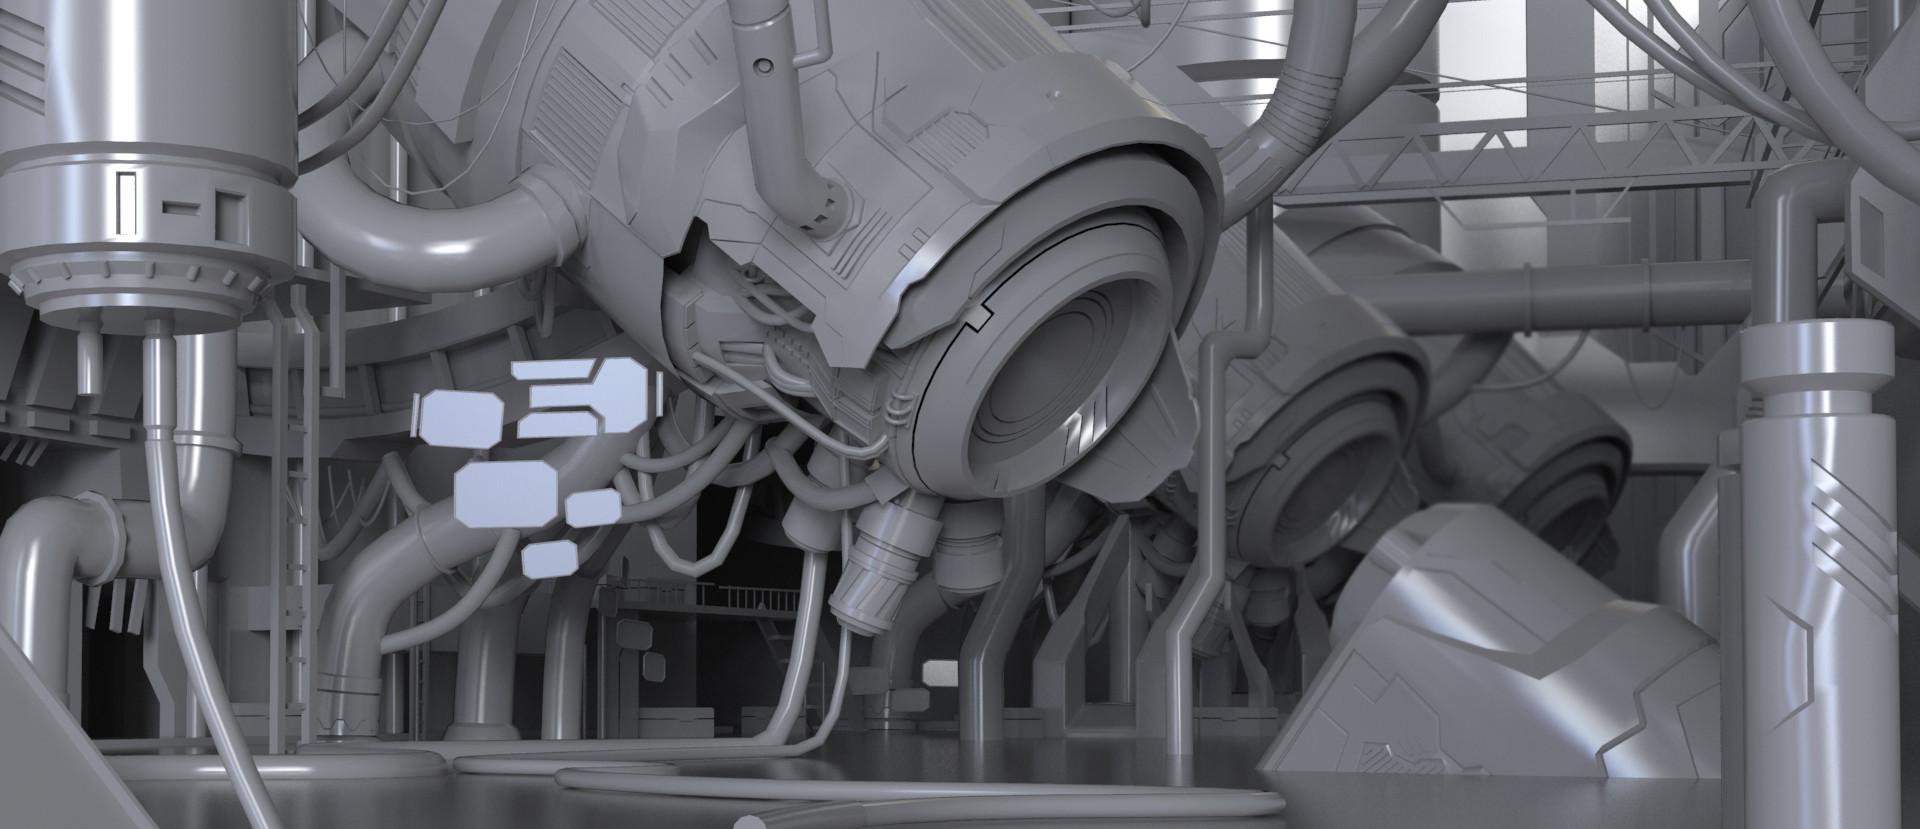 Charles antoine breton sci fi lab 1